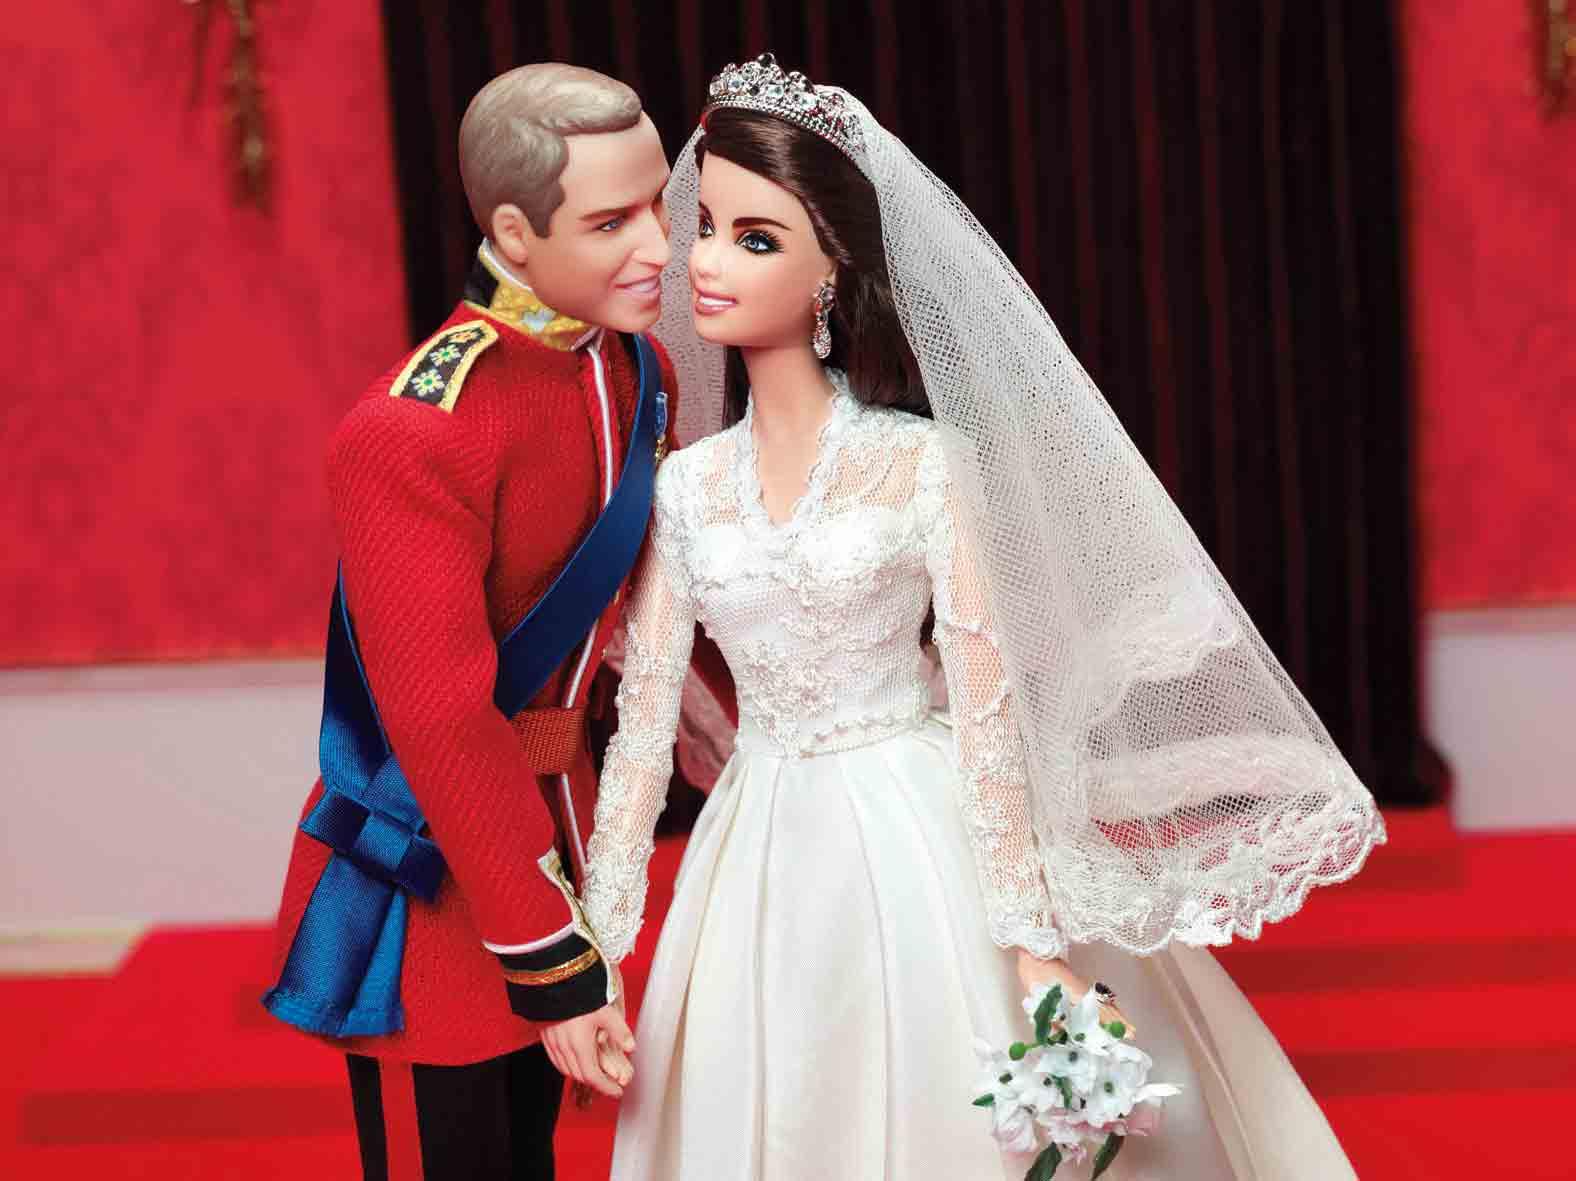 prince and princess wedding dress up games » Wedding Dresses Designs ...